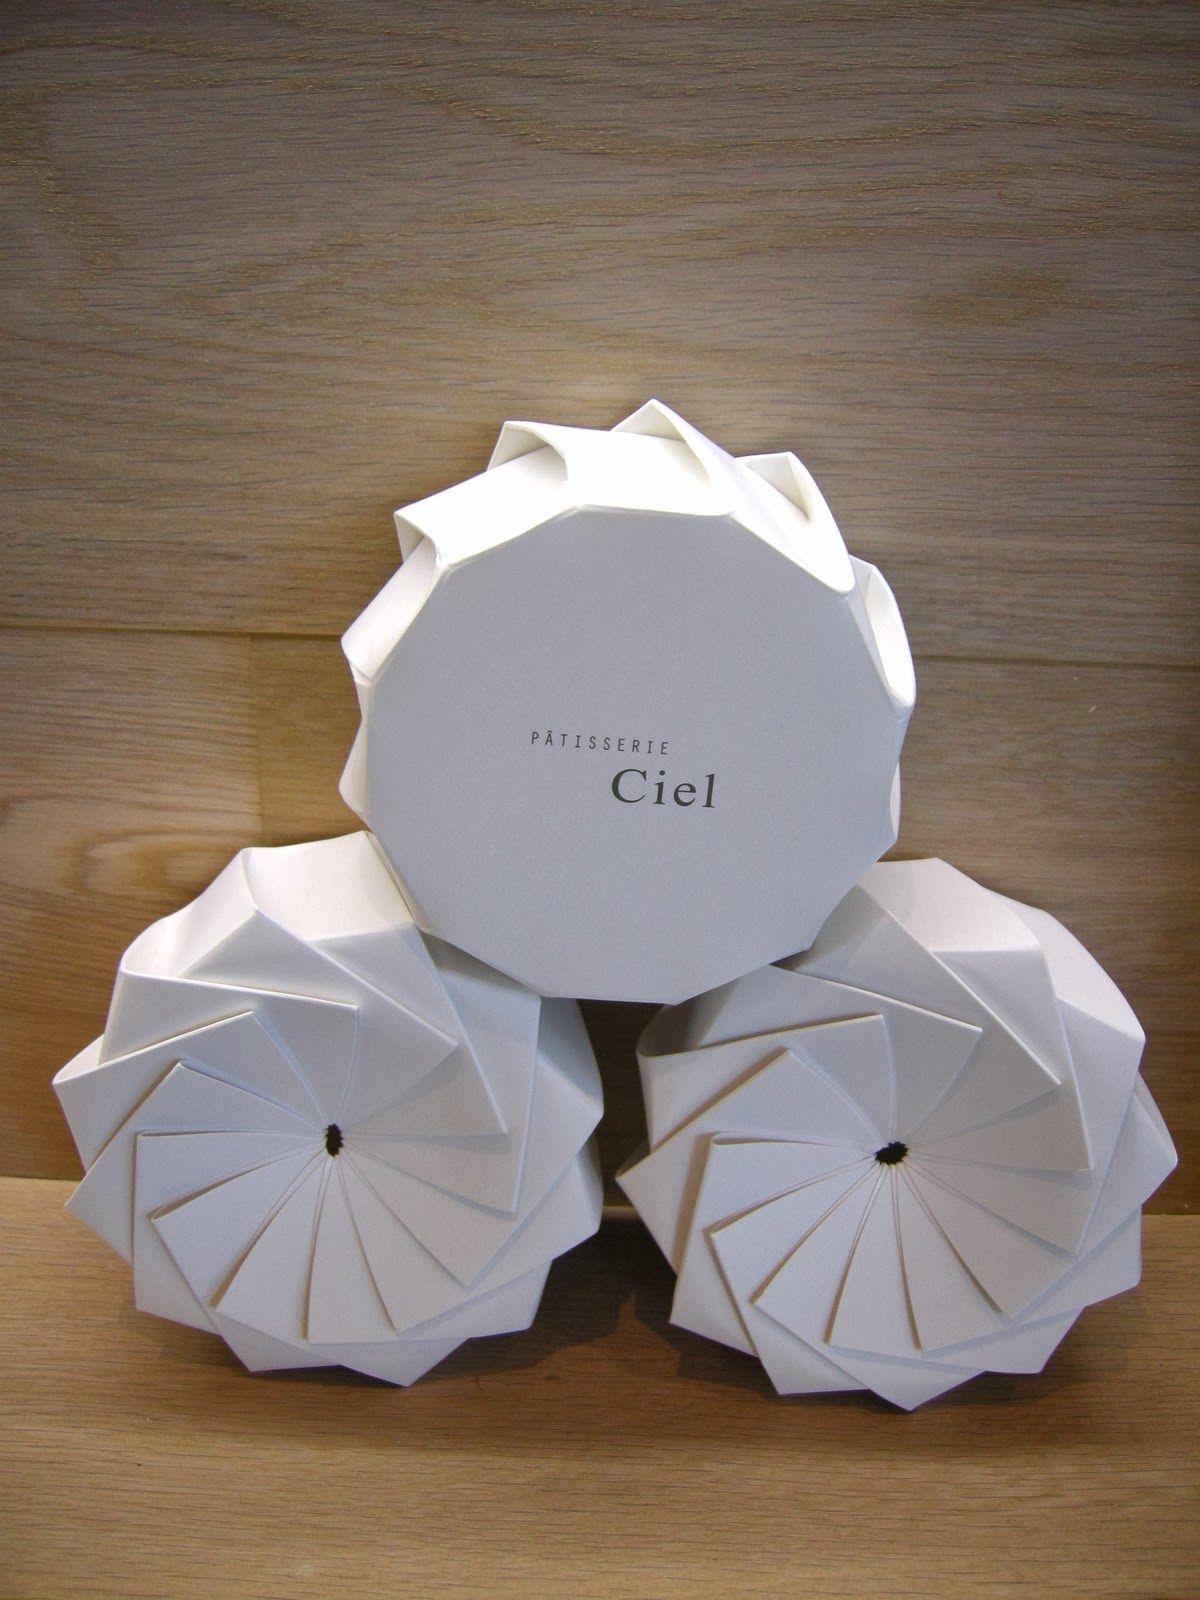 boite origami tuto origami pinterest origami boite et tuto. Black Bedroom Furniture Sets. Home Design Ideas